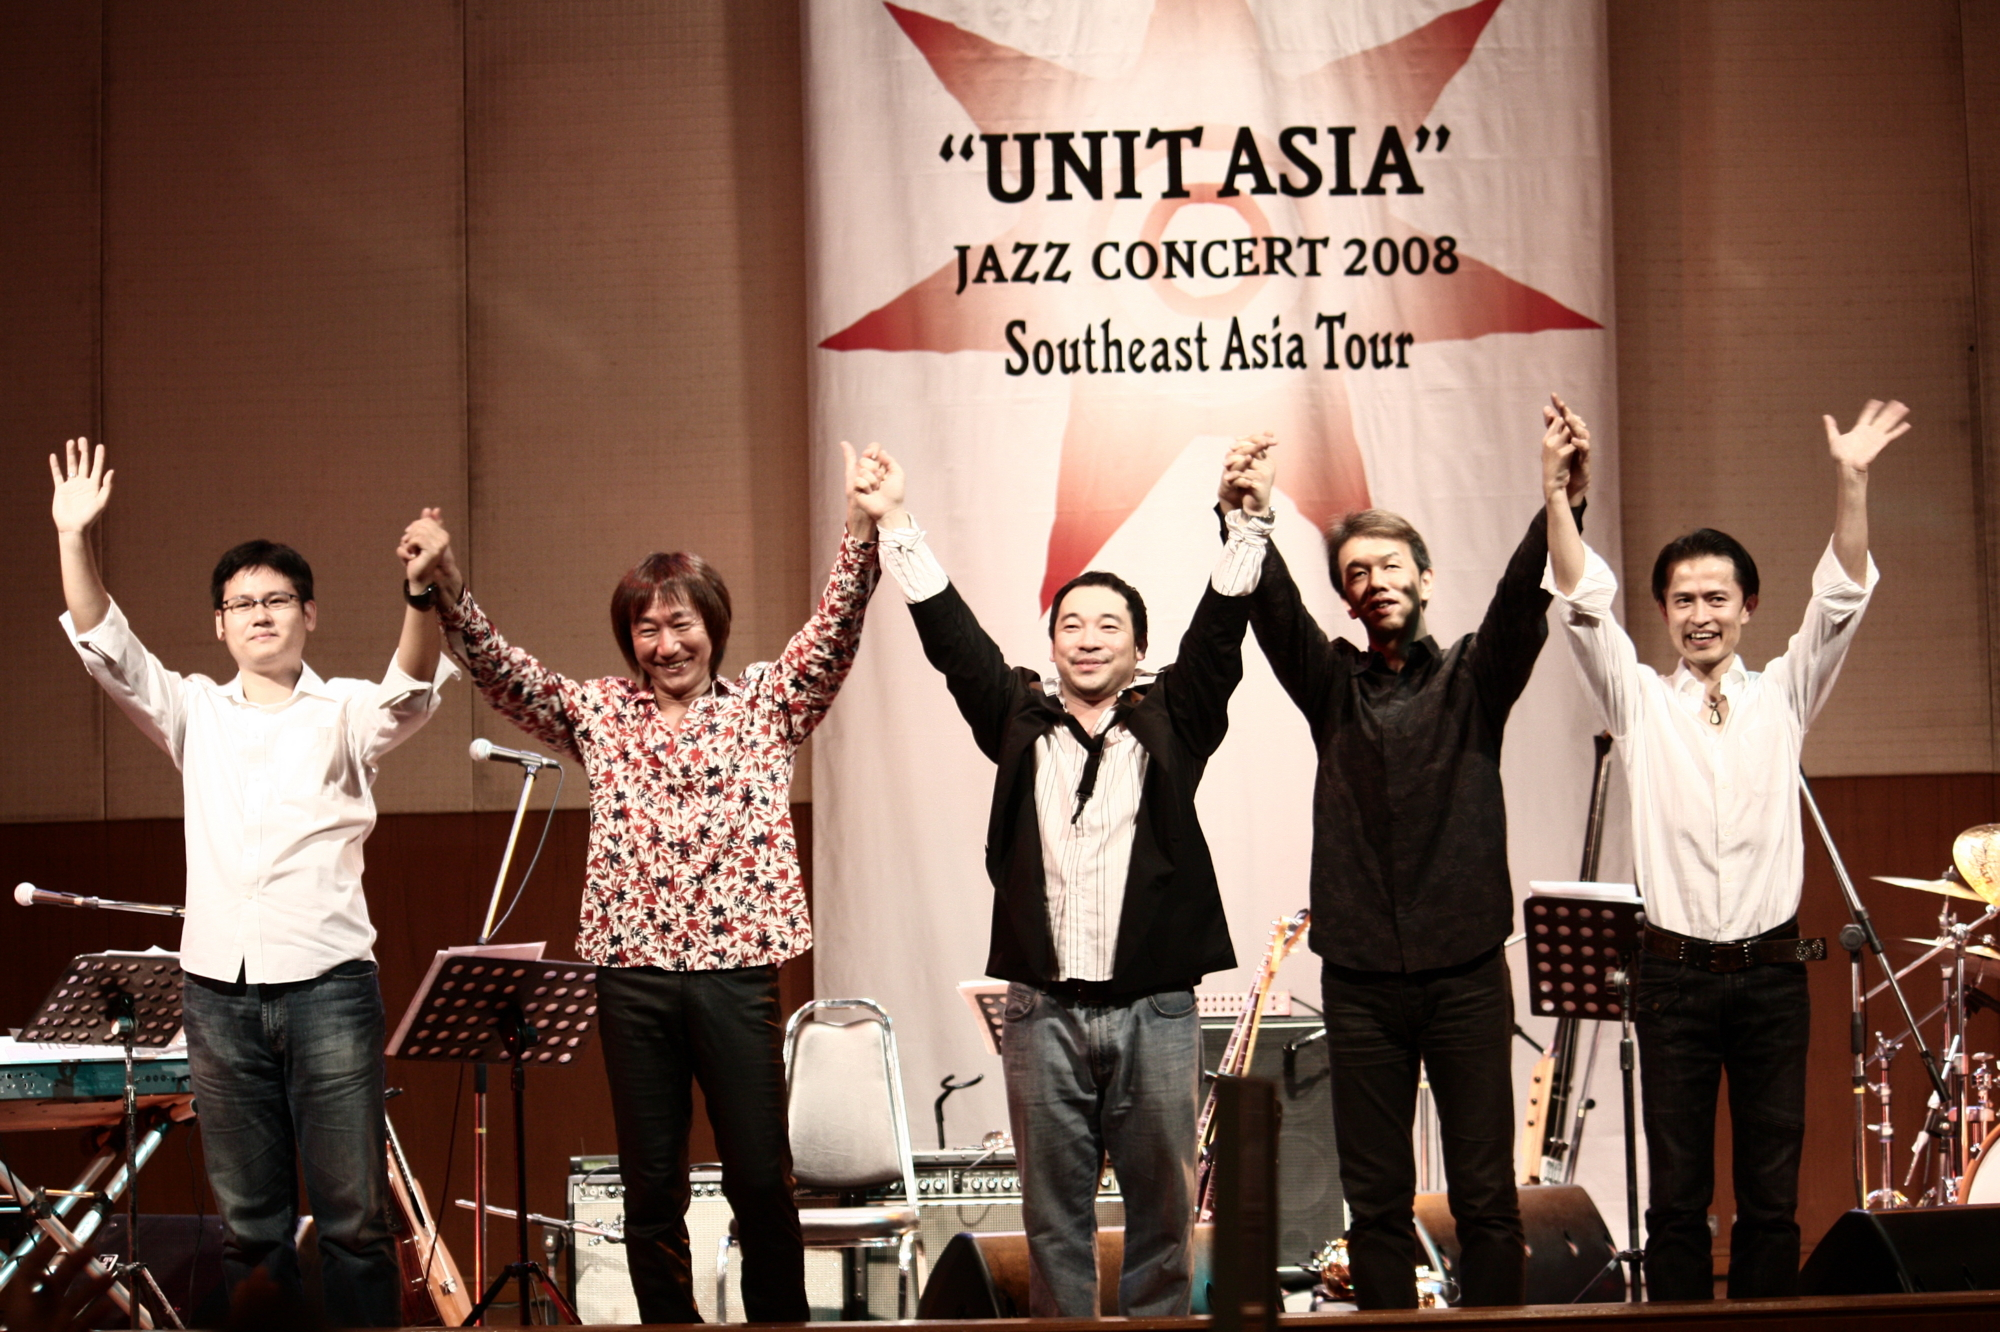 f:id:japanfoundation:20090119202531j:image:right:w220